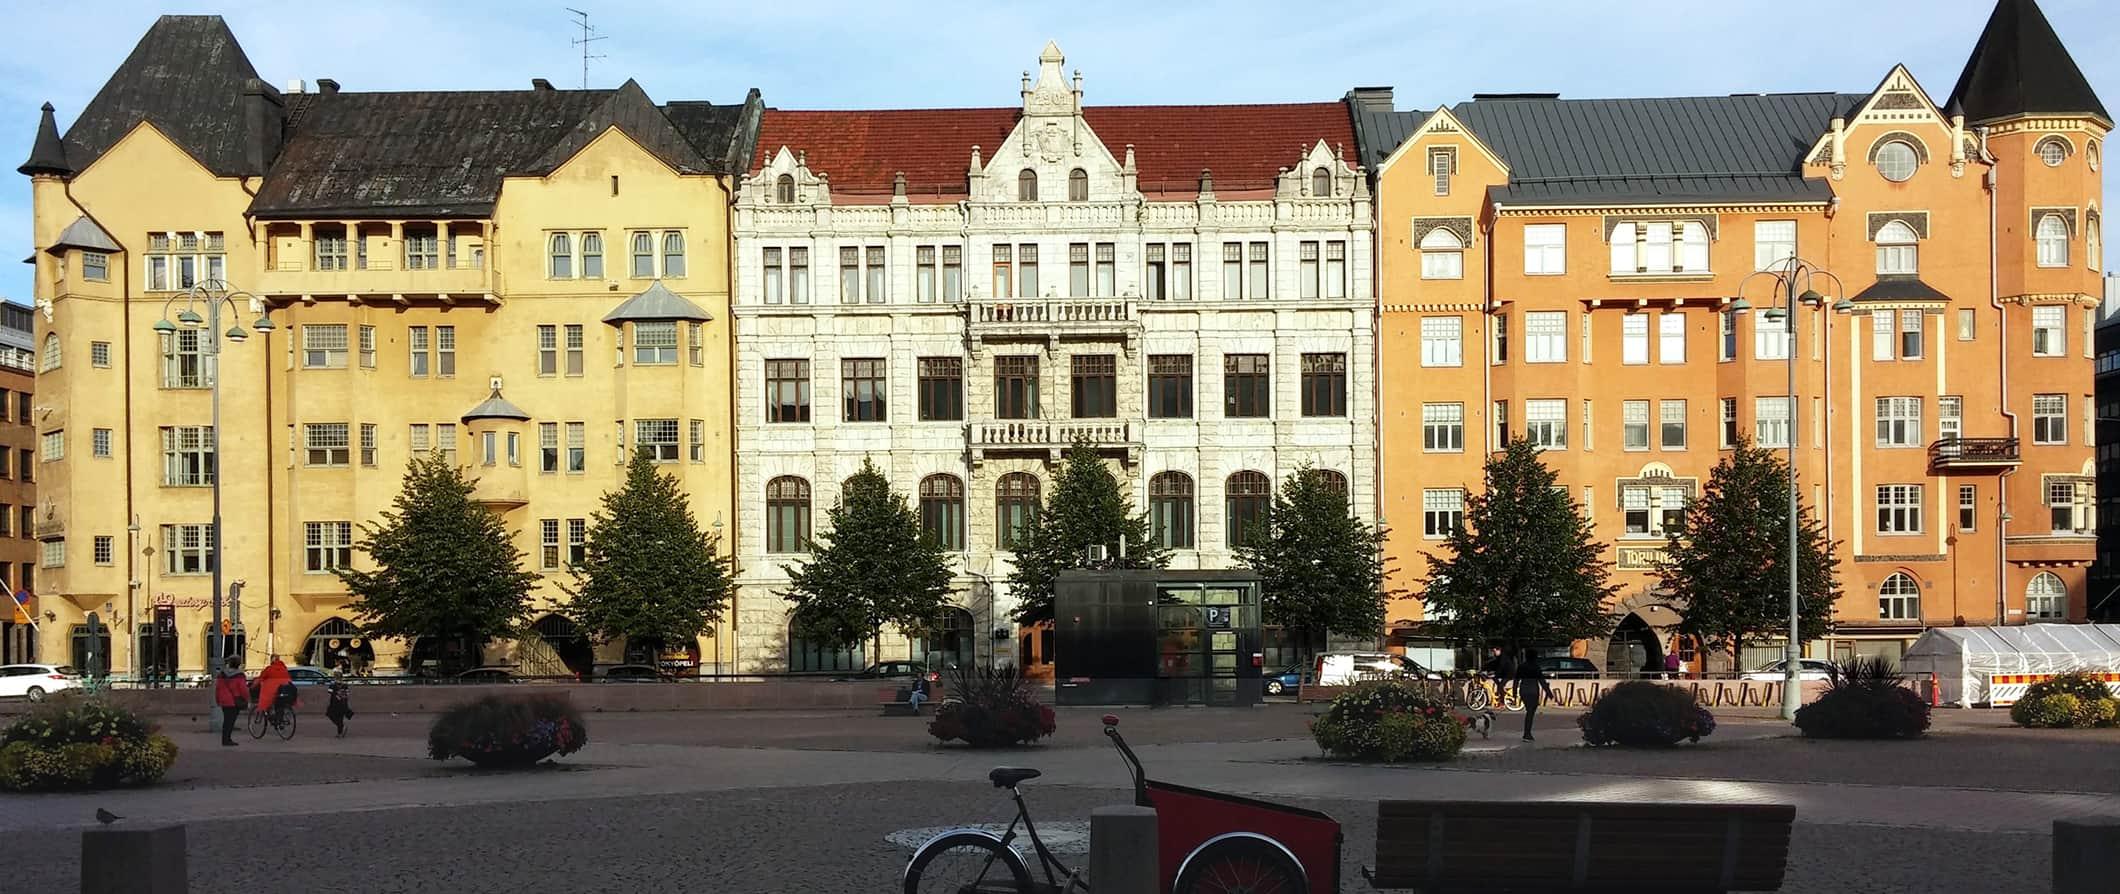 colorful buildings in Helsinki